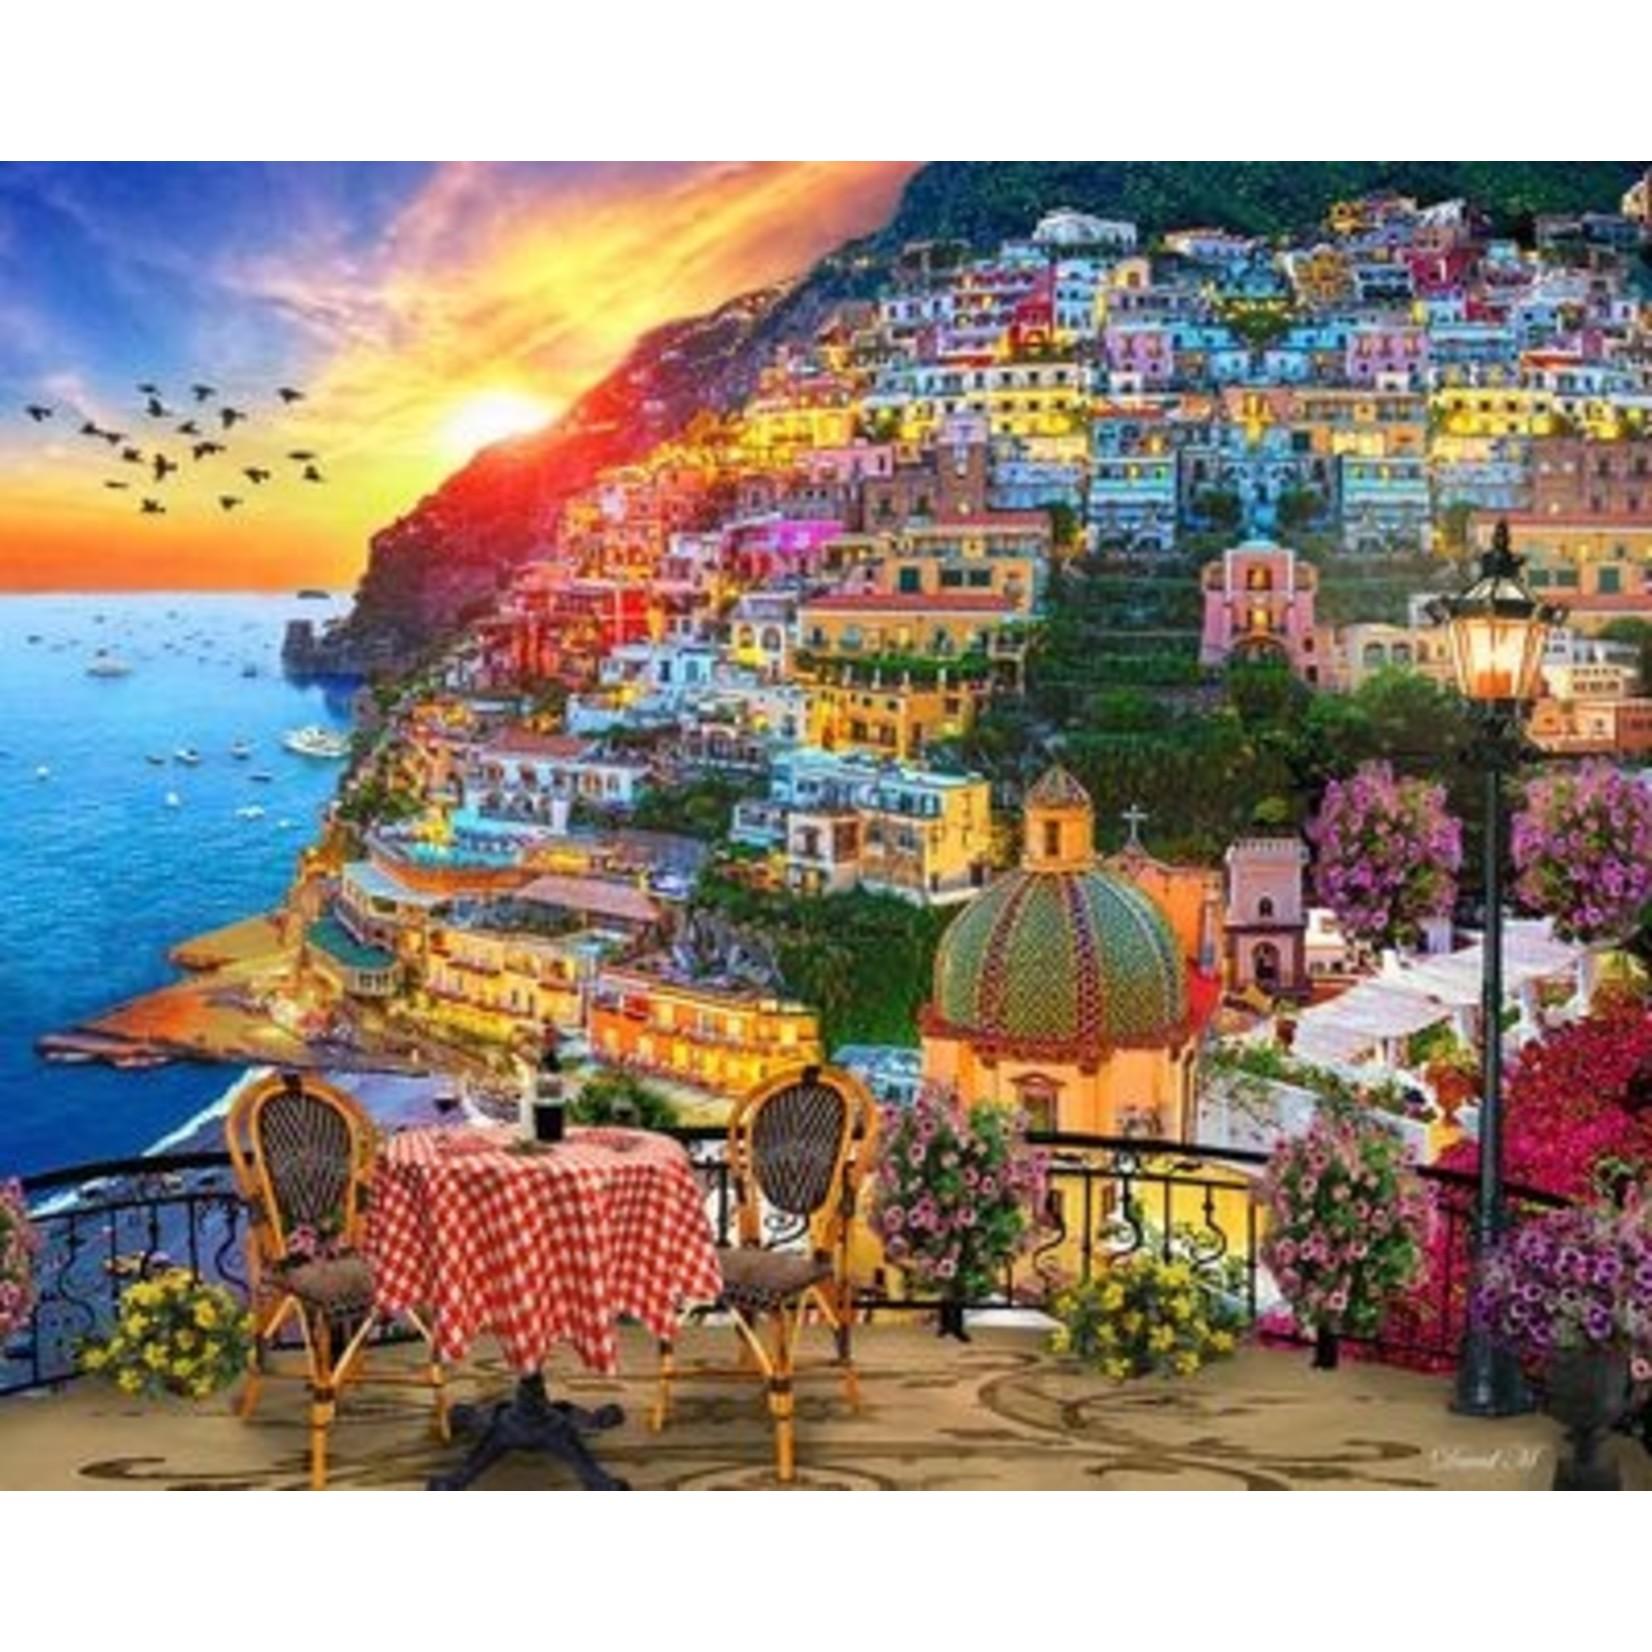 POSITANO ITALY 1000 PIECE JIGSAW PUZZLE